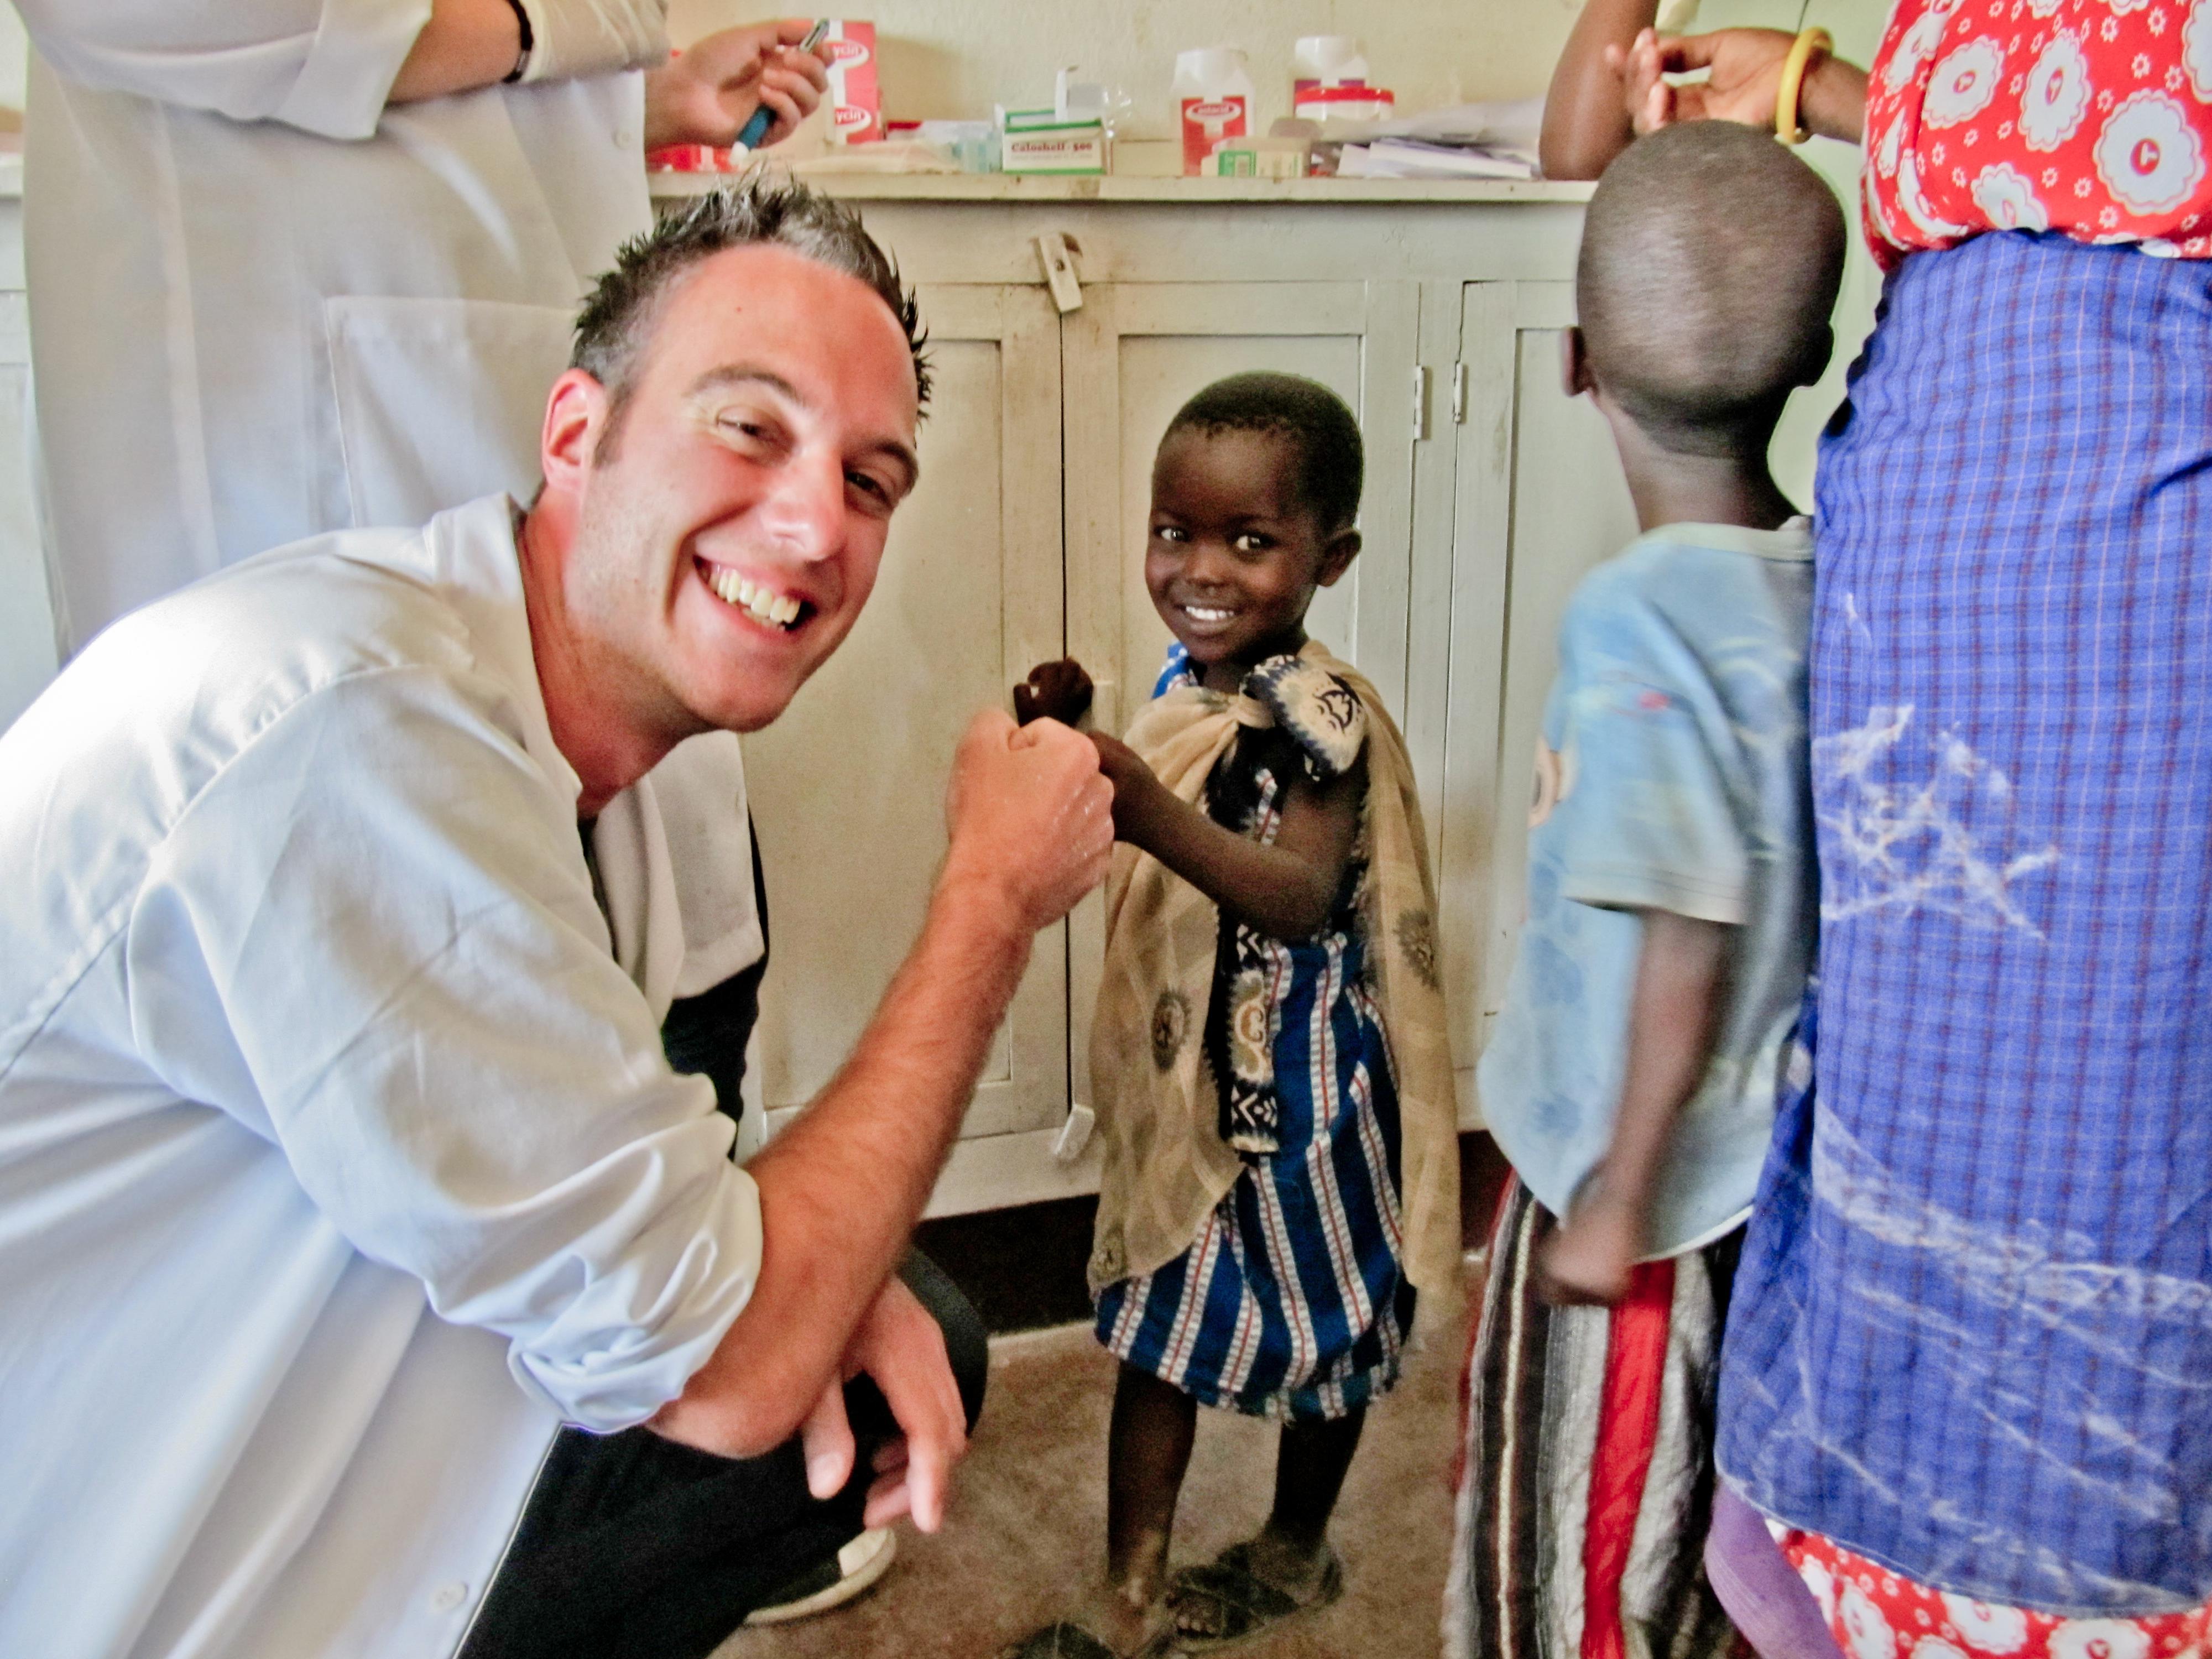 un volontaire en voyage solidaire de médecine avec un enfant souriant en Tanzanie